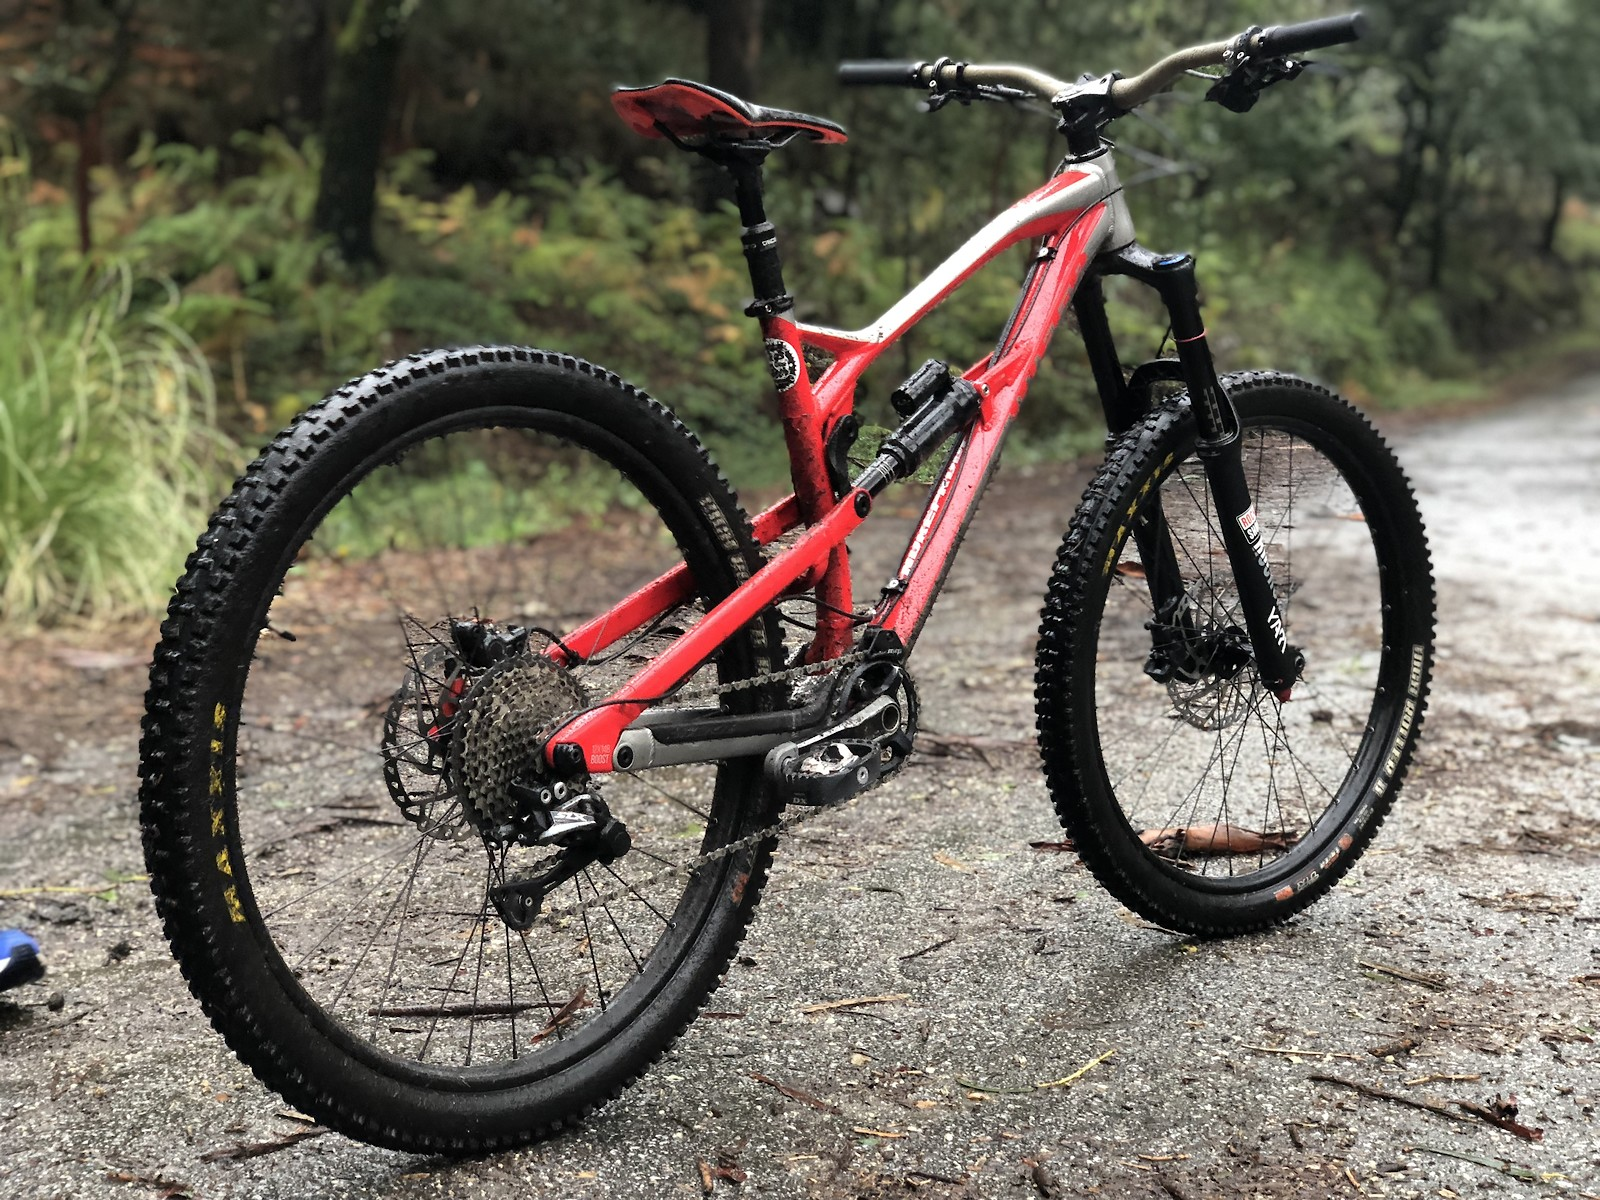 E21981D0-933B-4119-ADCB-D06792680E36 - Ricardo_Azevedo - Mountain Biking Pictures - Vital MTB